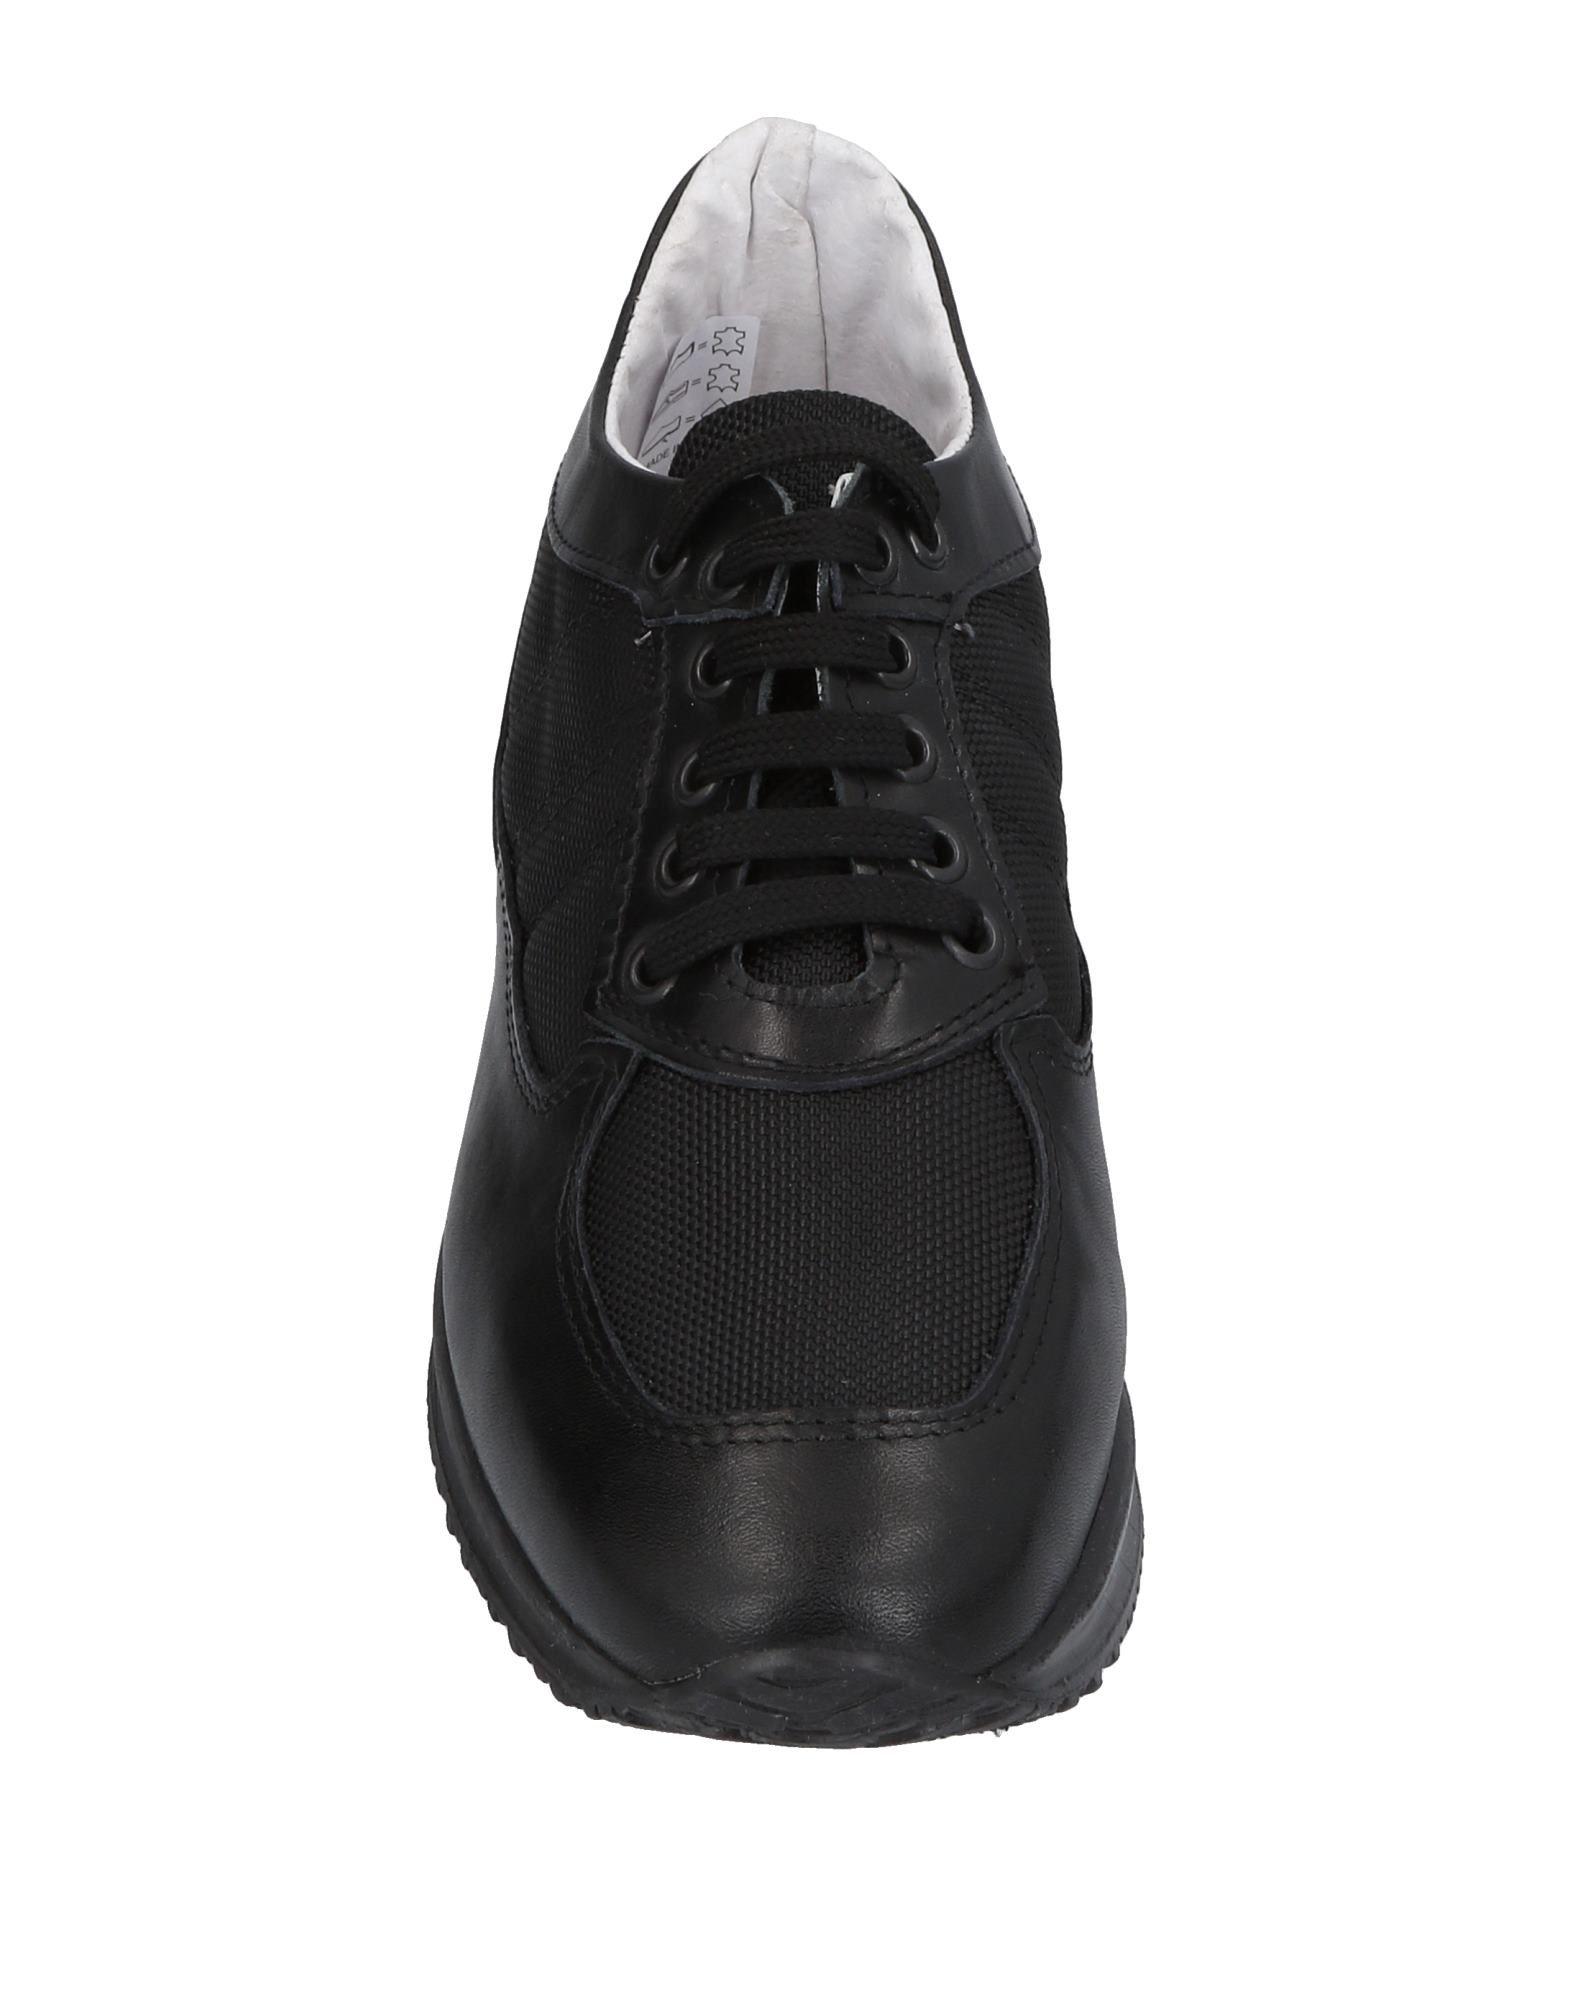 Roberto Della Croce Qualität Sneakers Damen  11460497DM Gute Qualität Croce beliebte Schuhe b4a277